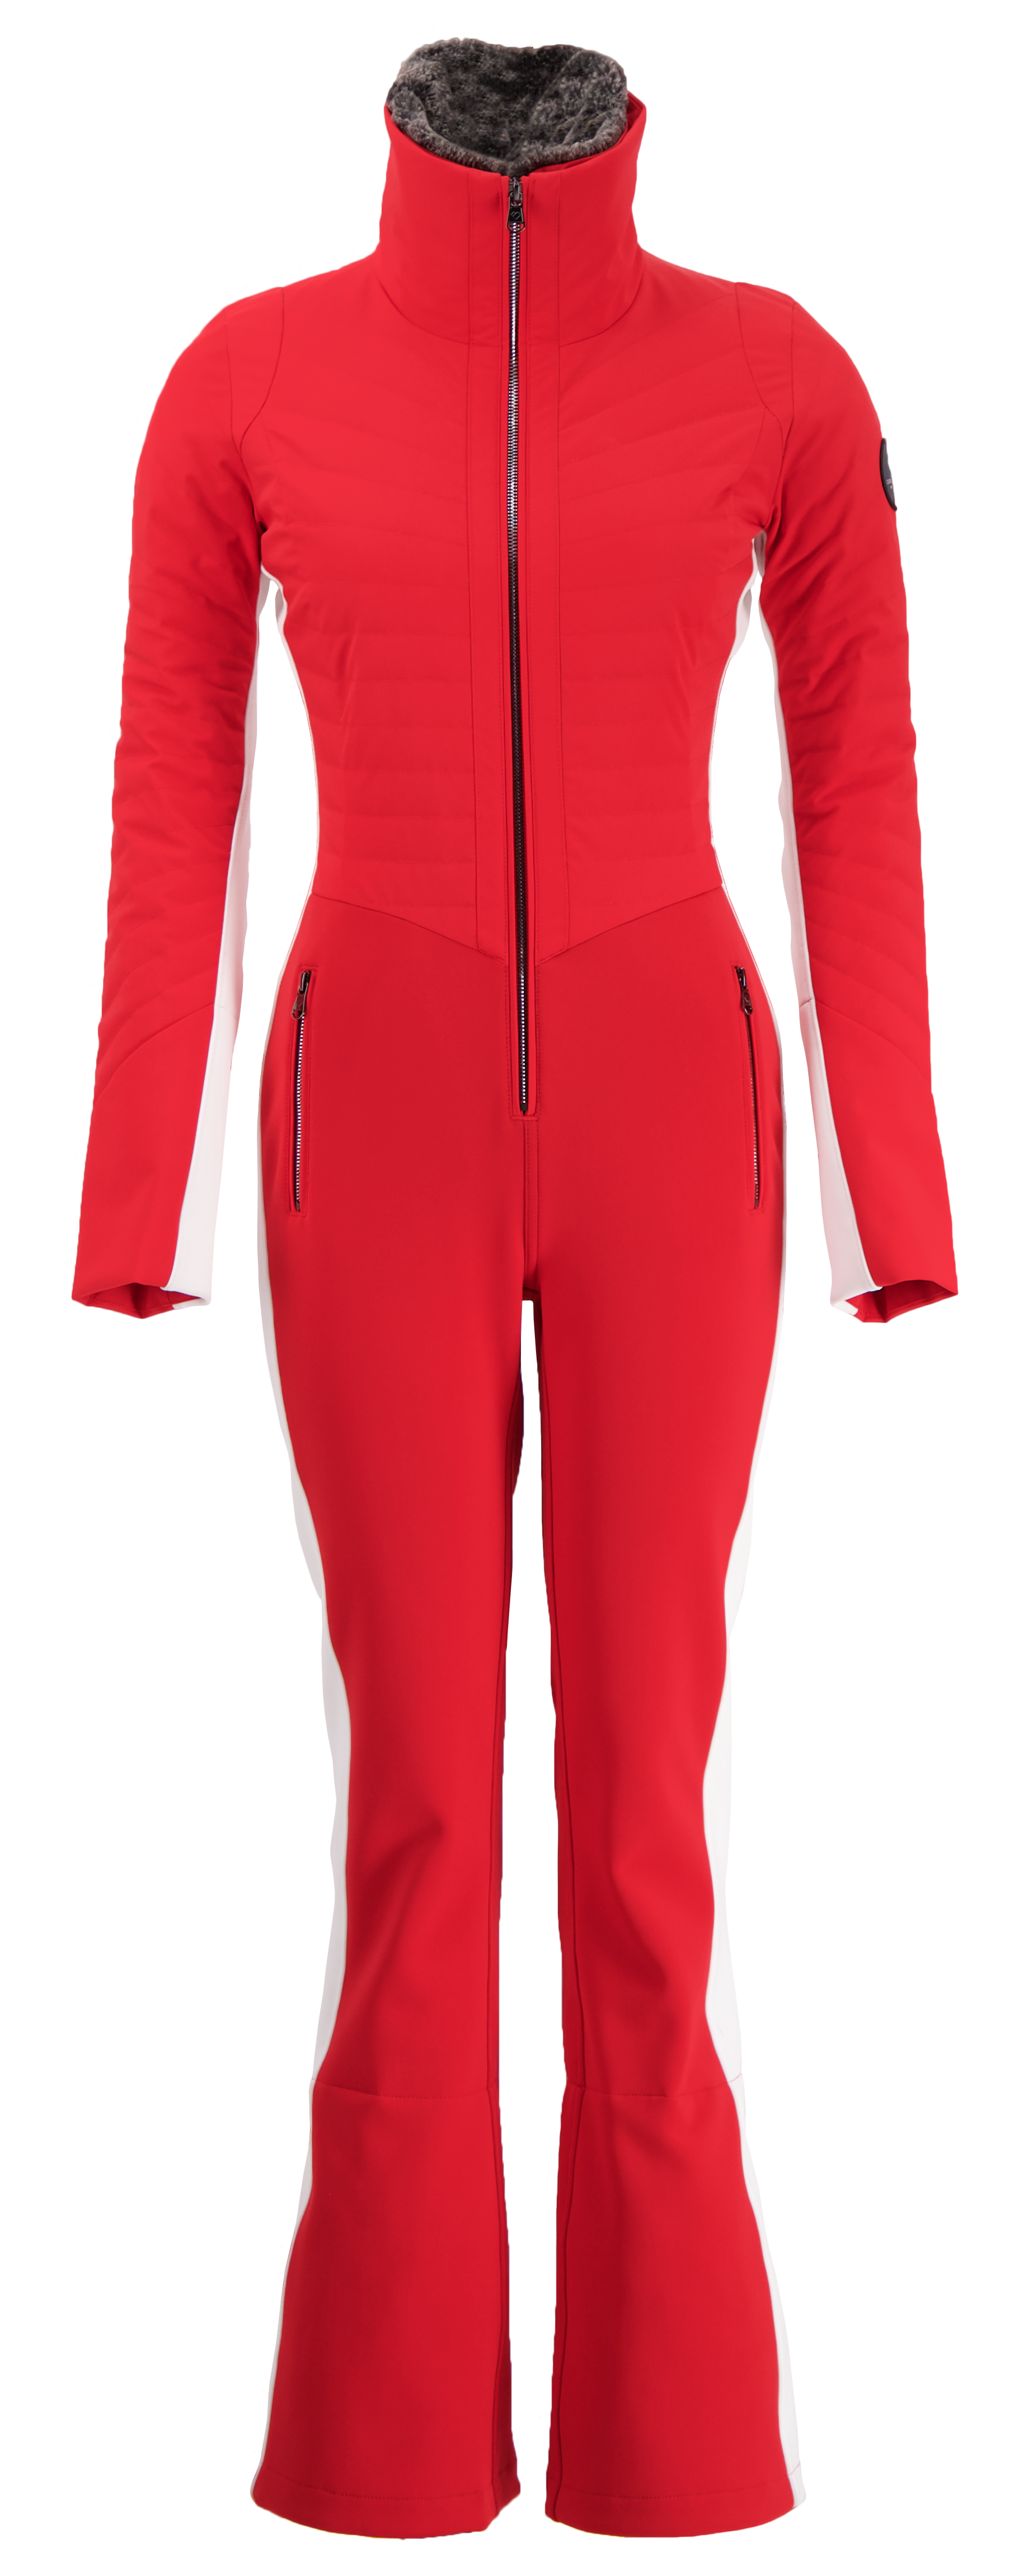 Franz Klammer   1976 Olympics   Ski Racing